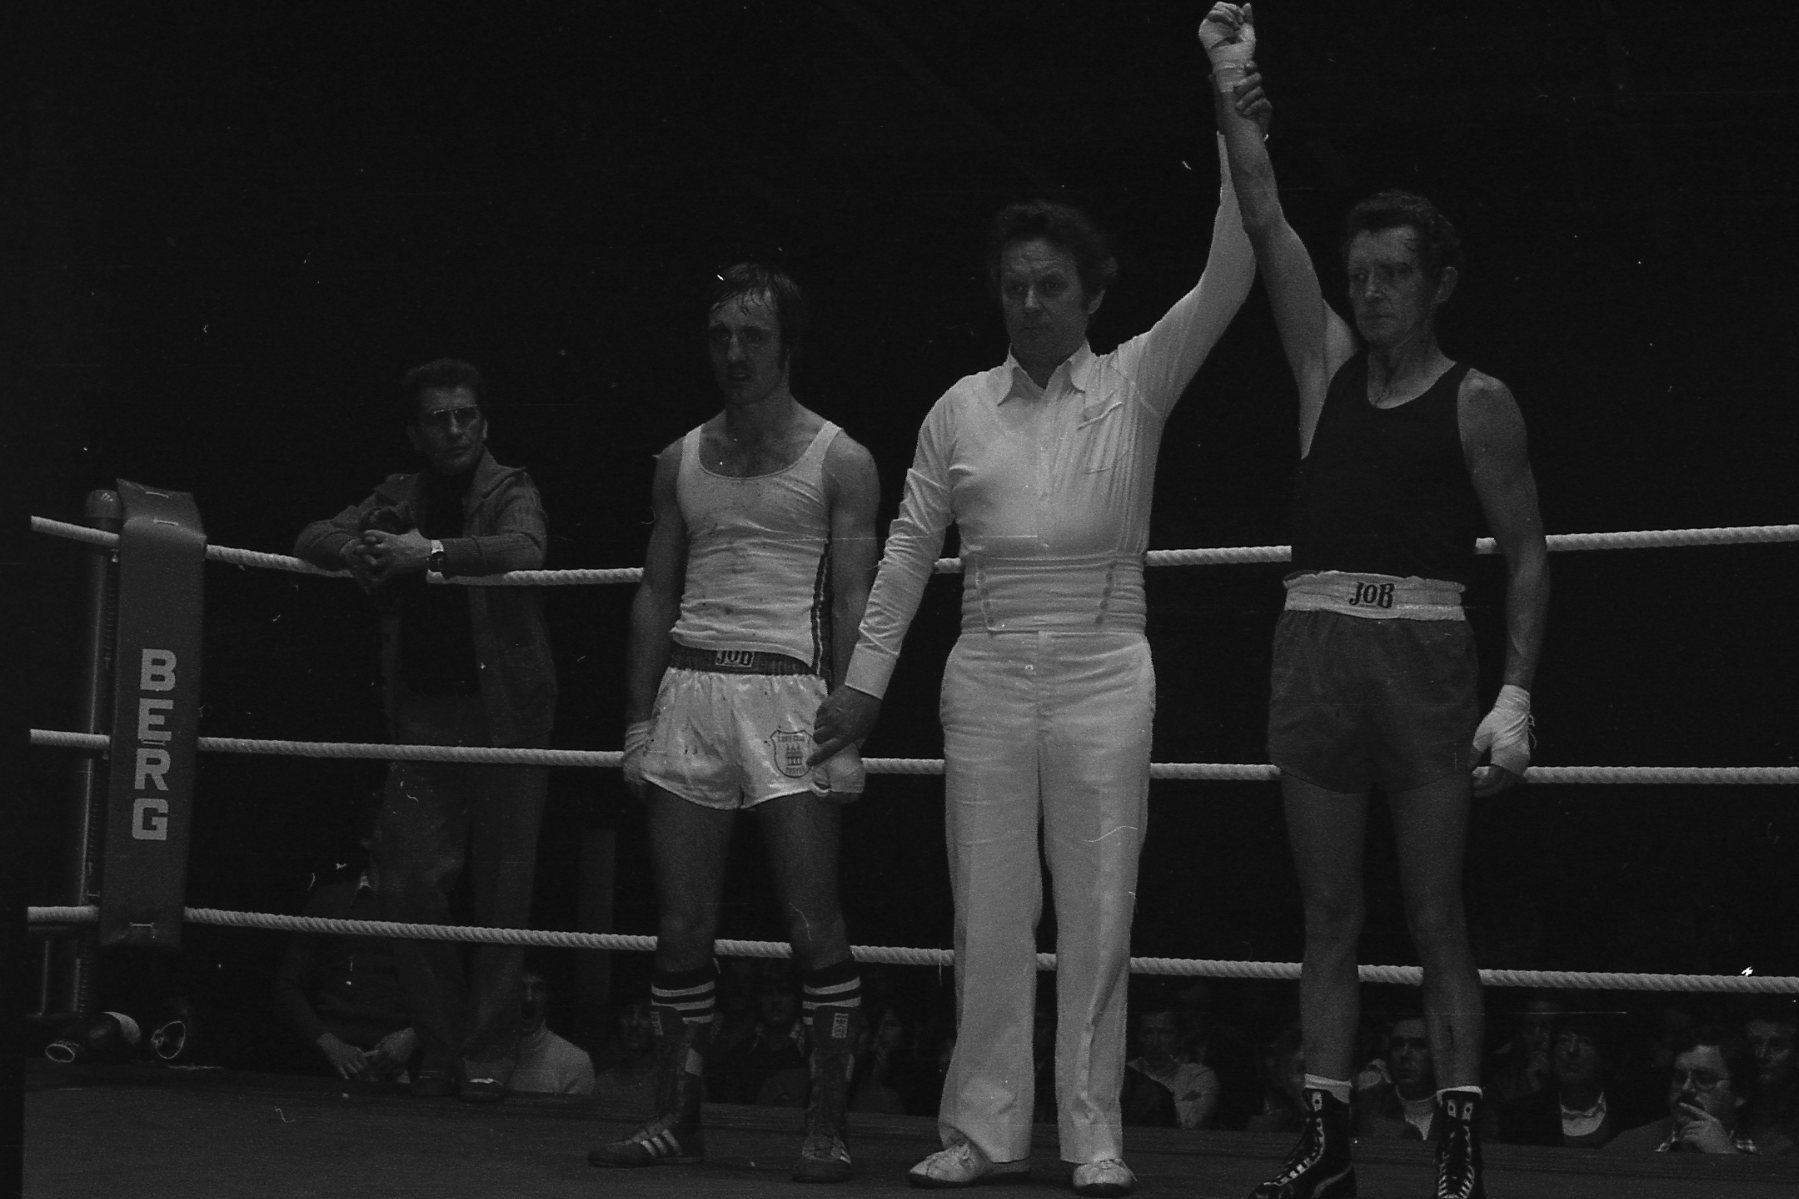 v.l.  B.Carra,BC Speyer,  Rudi Moos,Finale Südd.Meistersch. Hanau 1978, Punktsieger Moos,